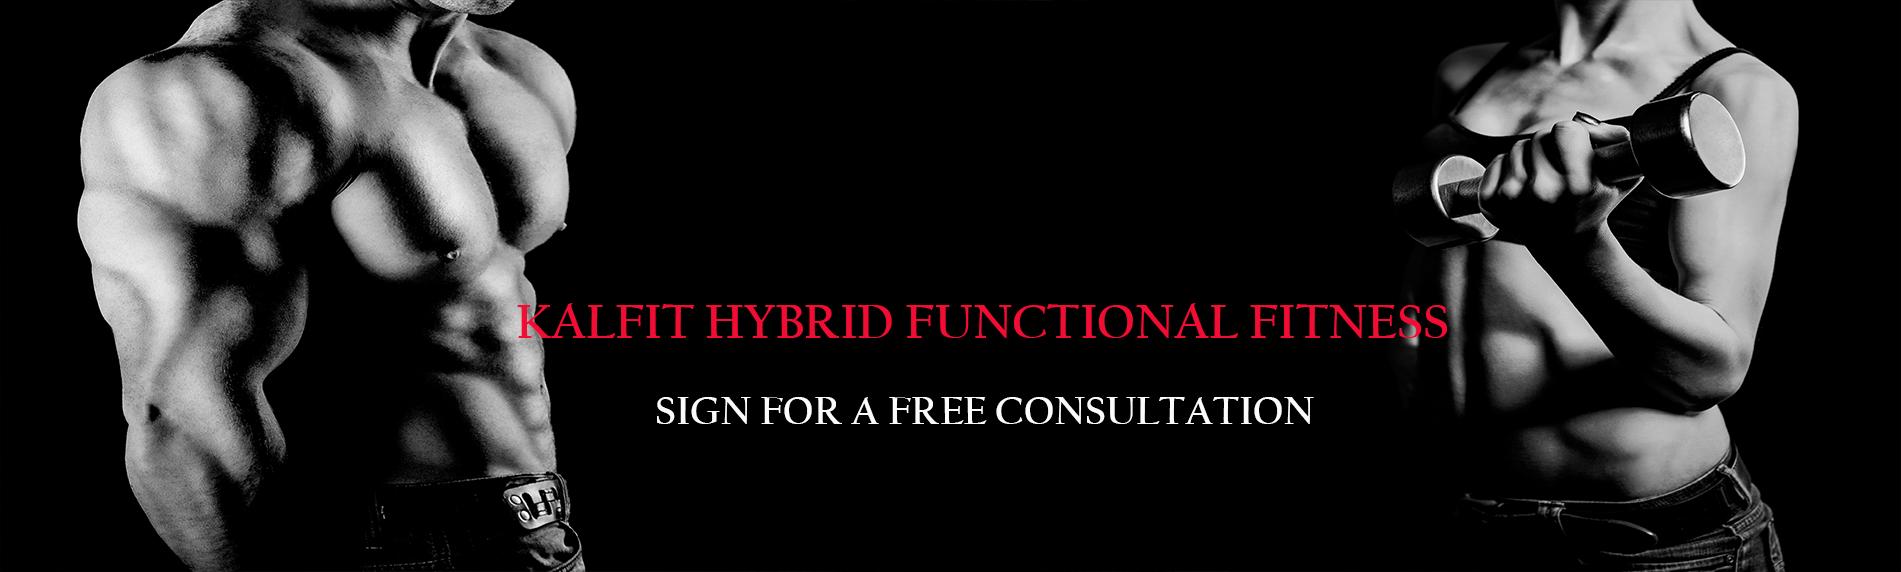 KALFIT HYBRID FUNCTIONAL FITNESS